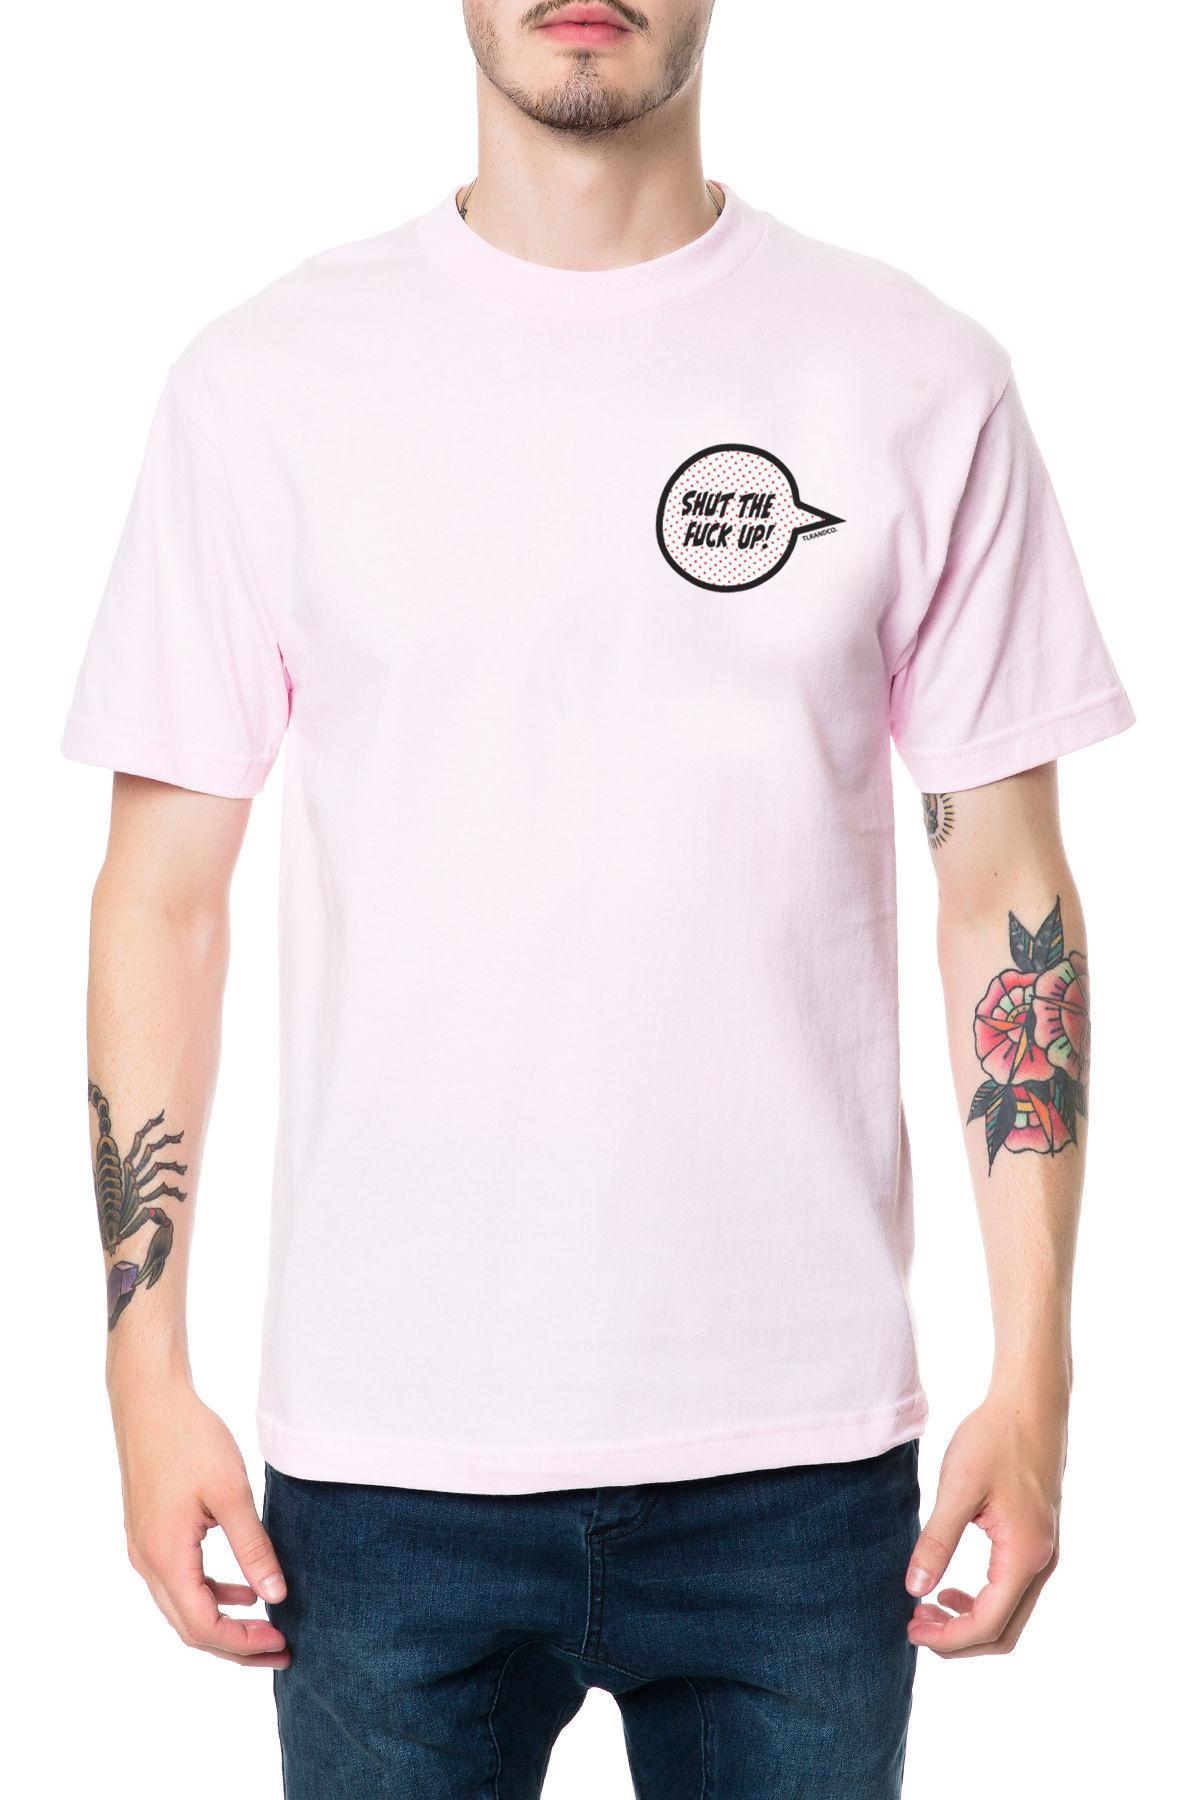 The STFU Tee in Pink